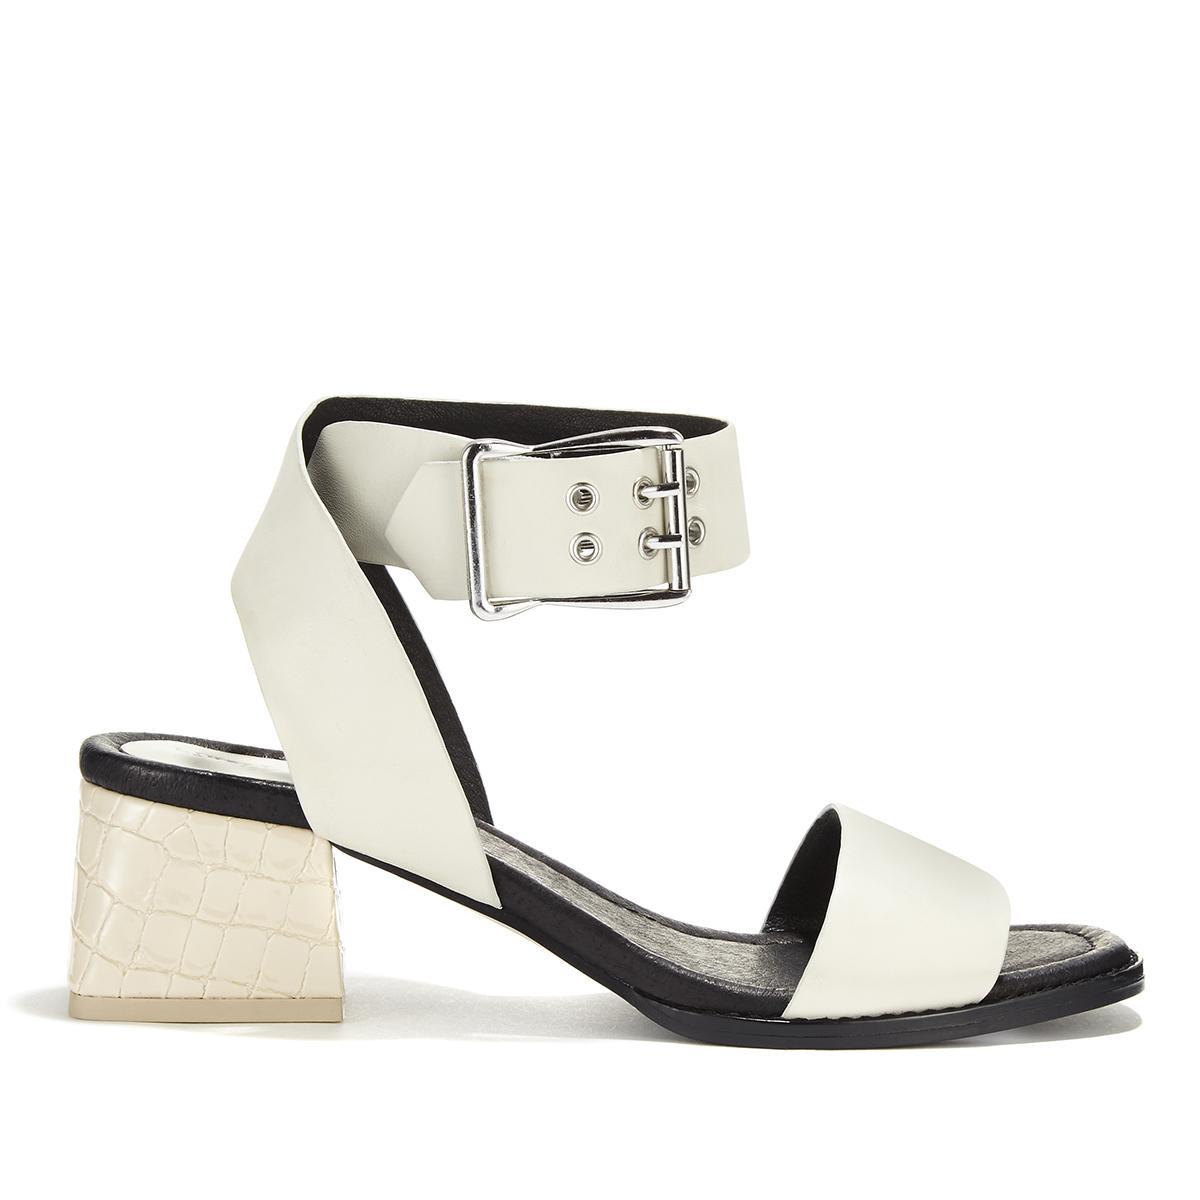 Finery London HOWLING - Sandals - white lA6KjlAj